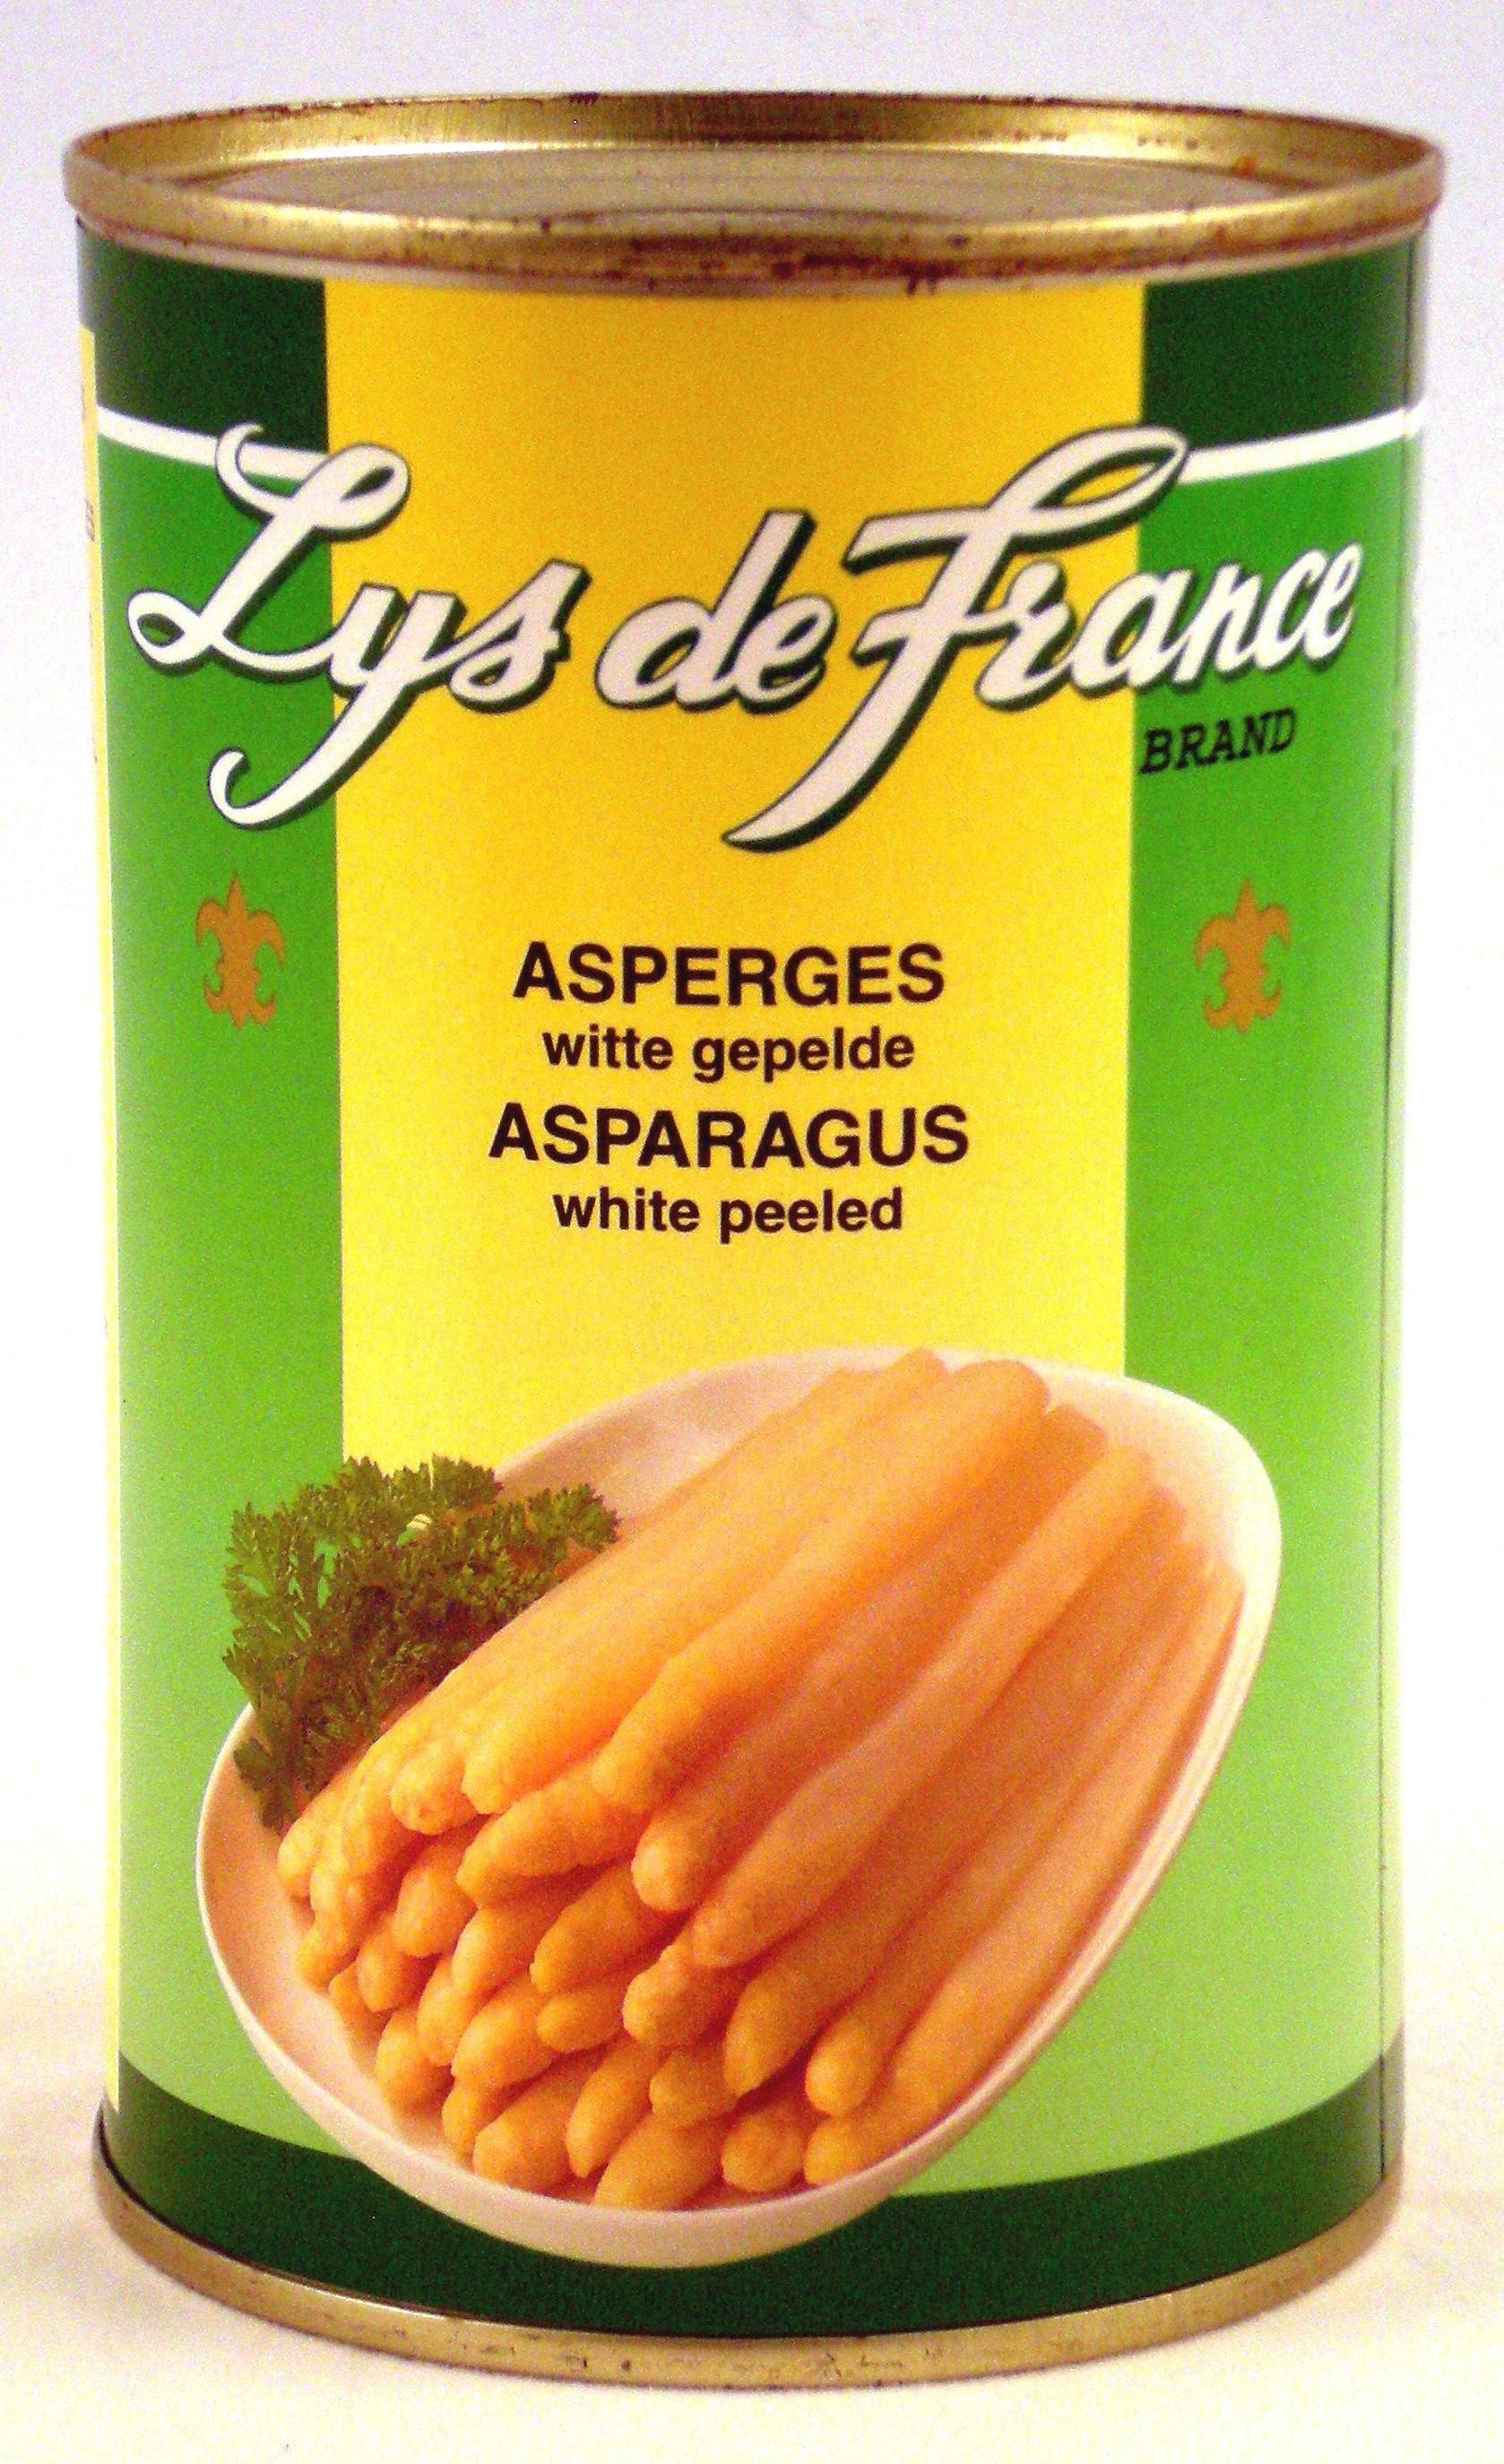 Witte asperges gepeld 1L Lys de France